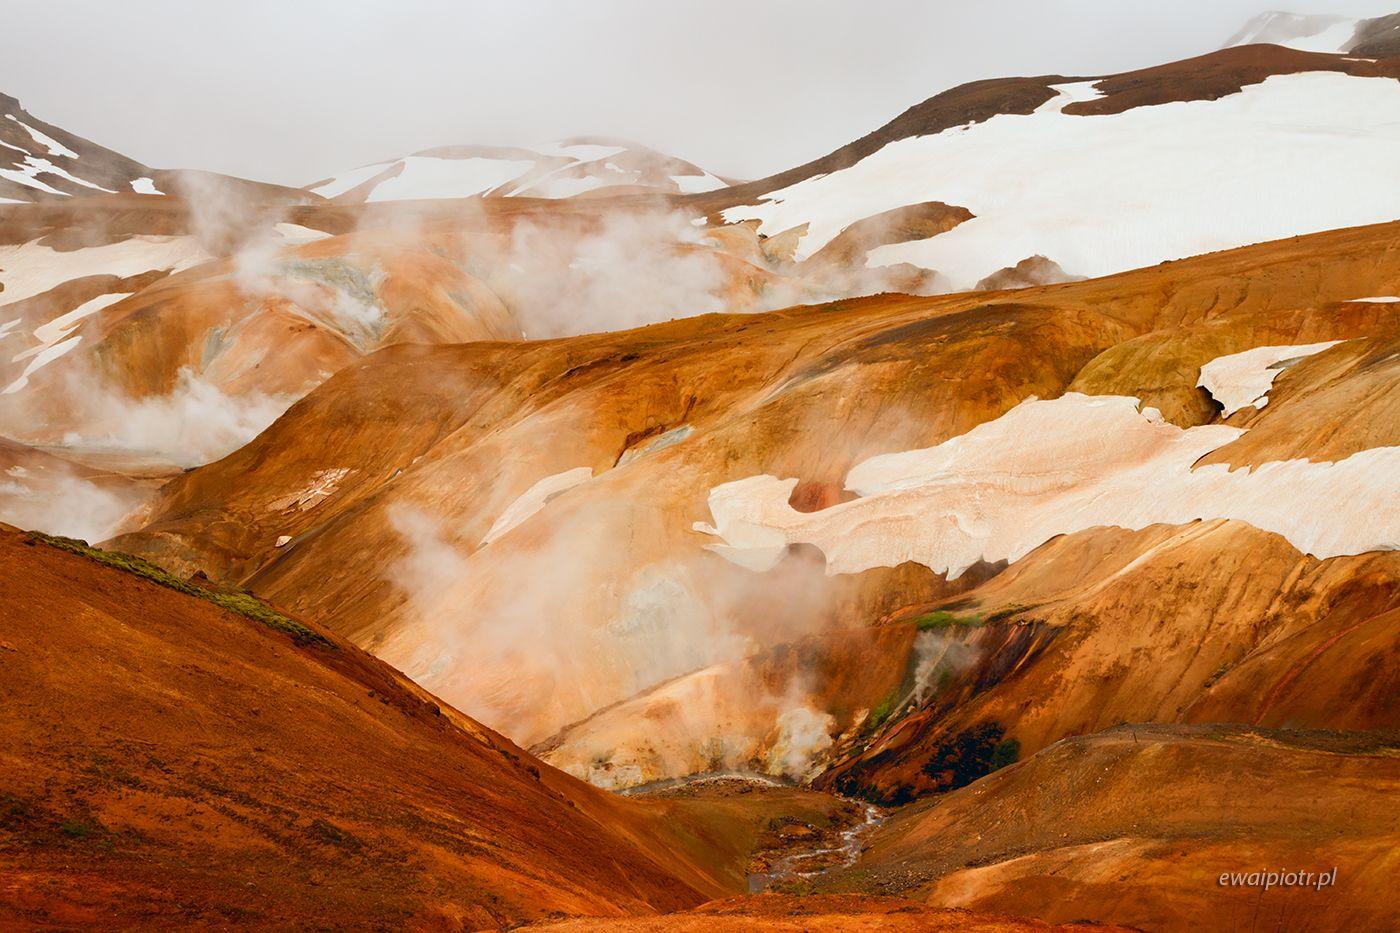 Kerlingarfjoll - para, śnieg i pomarańcz, Islandia